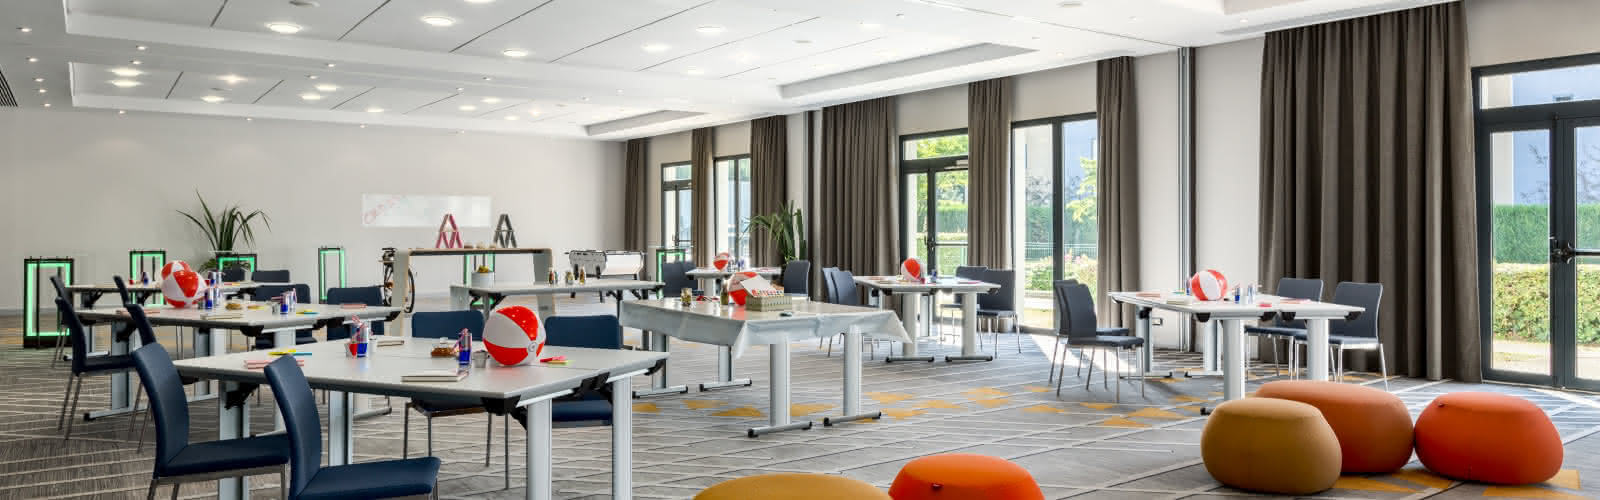 Loft 1-2-3 Meeting imagined Creativity Style Set-up